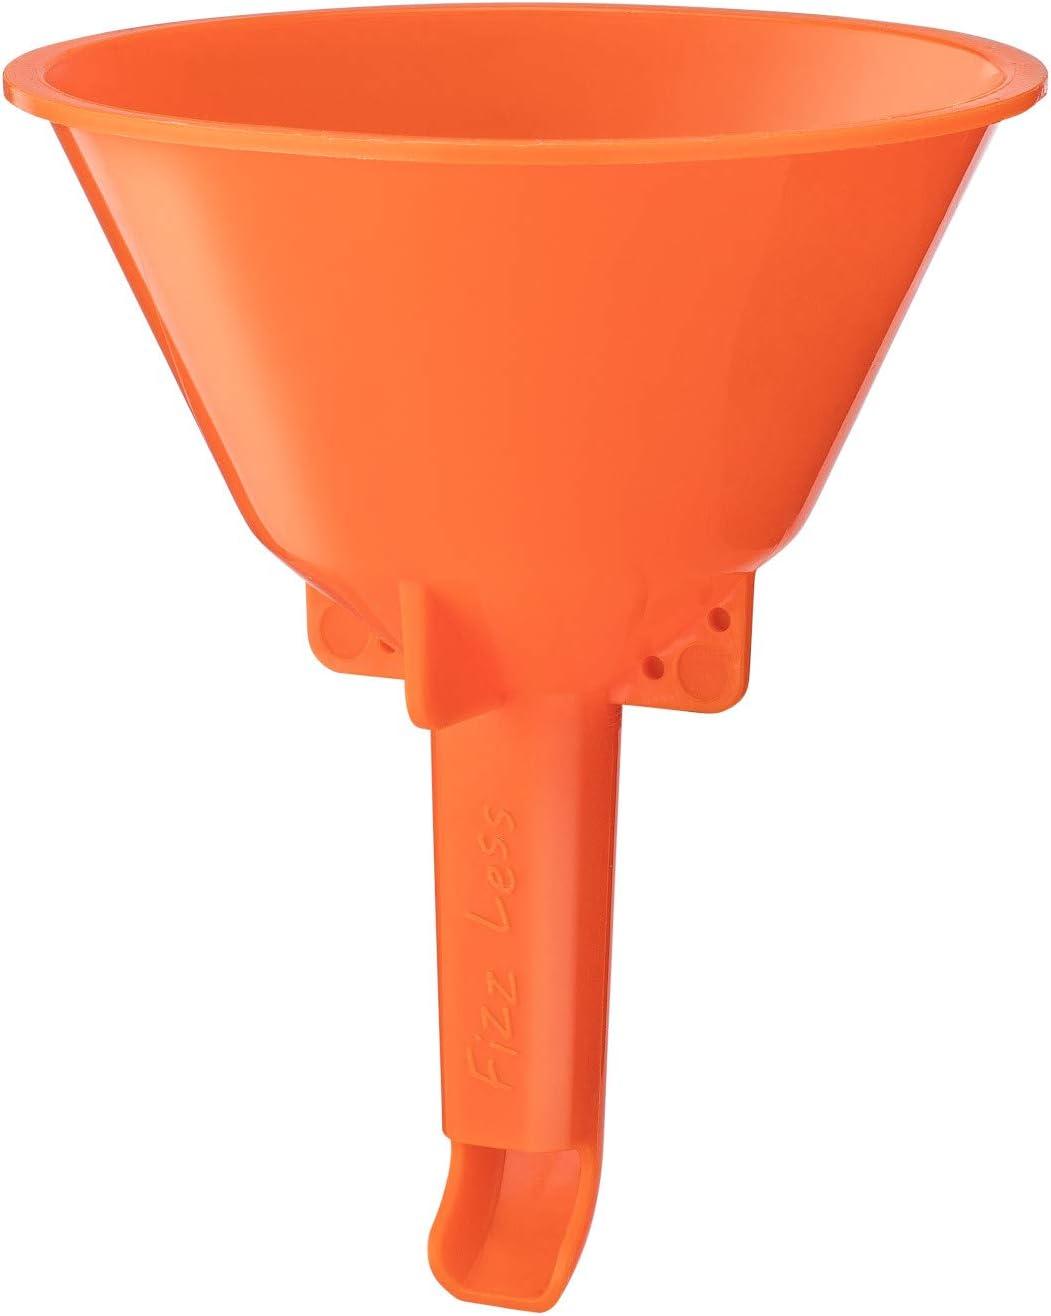 Fizz Less Bottling Funnel | Reduce Foaming Significantly when Filling Bottles | Homebrew Beer, Kombucha, Jun, Kefir, Soda | Grolsch-Style Flip Top, Swing Top, Glass Bottles